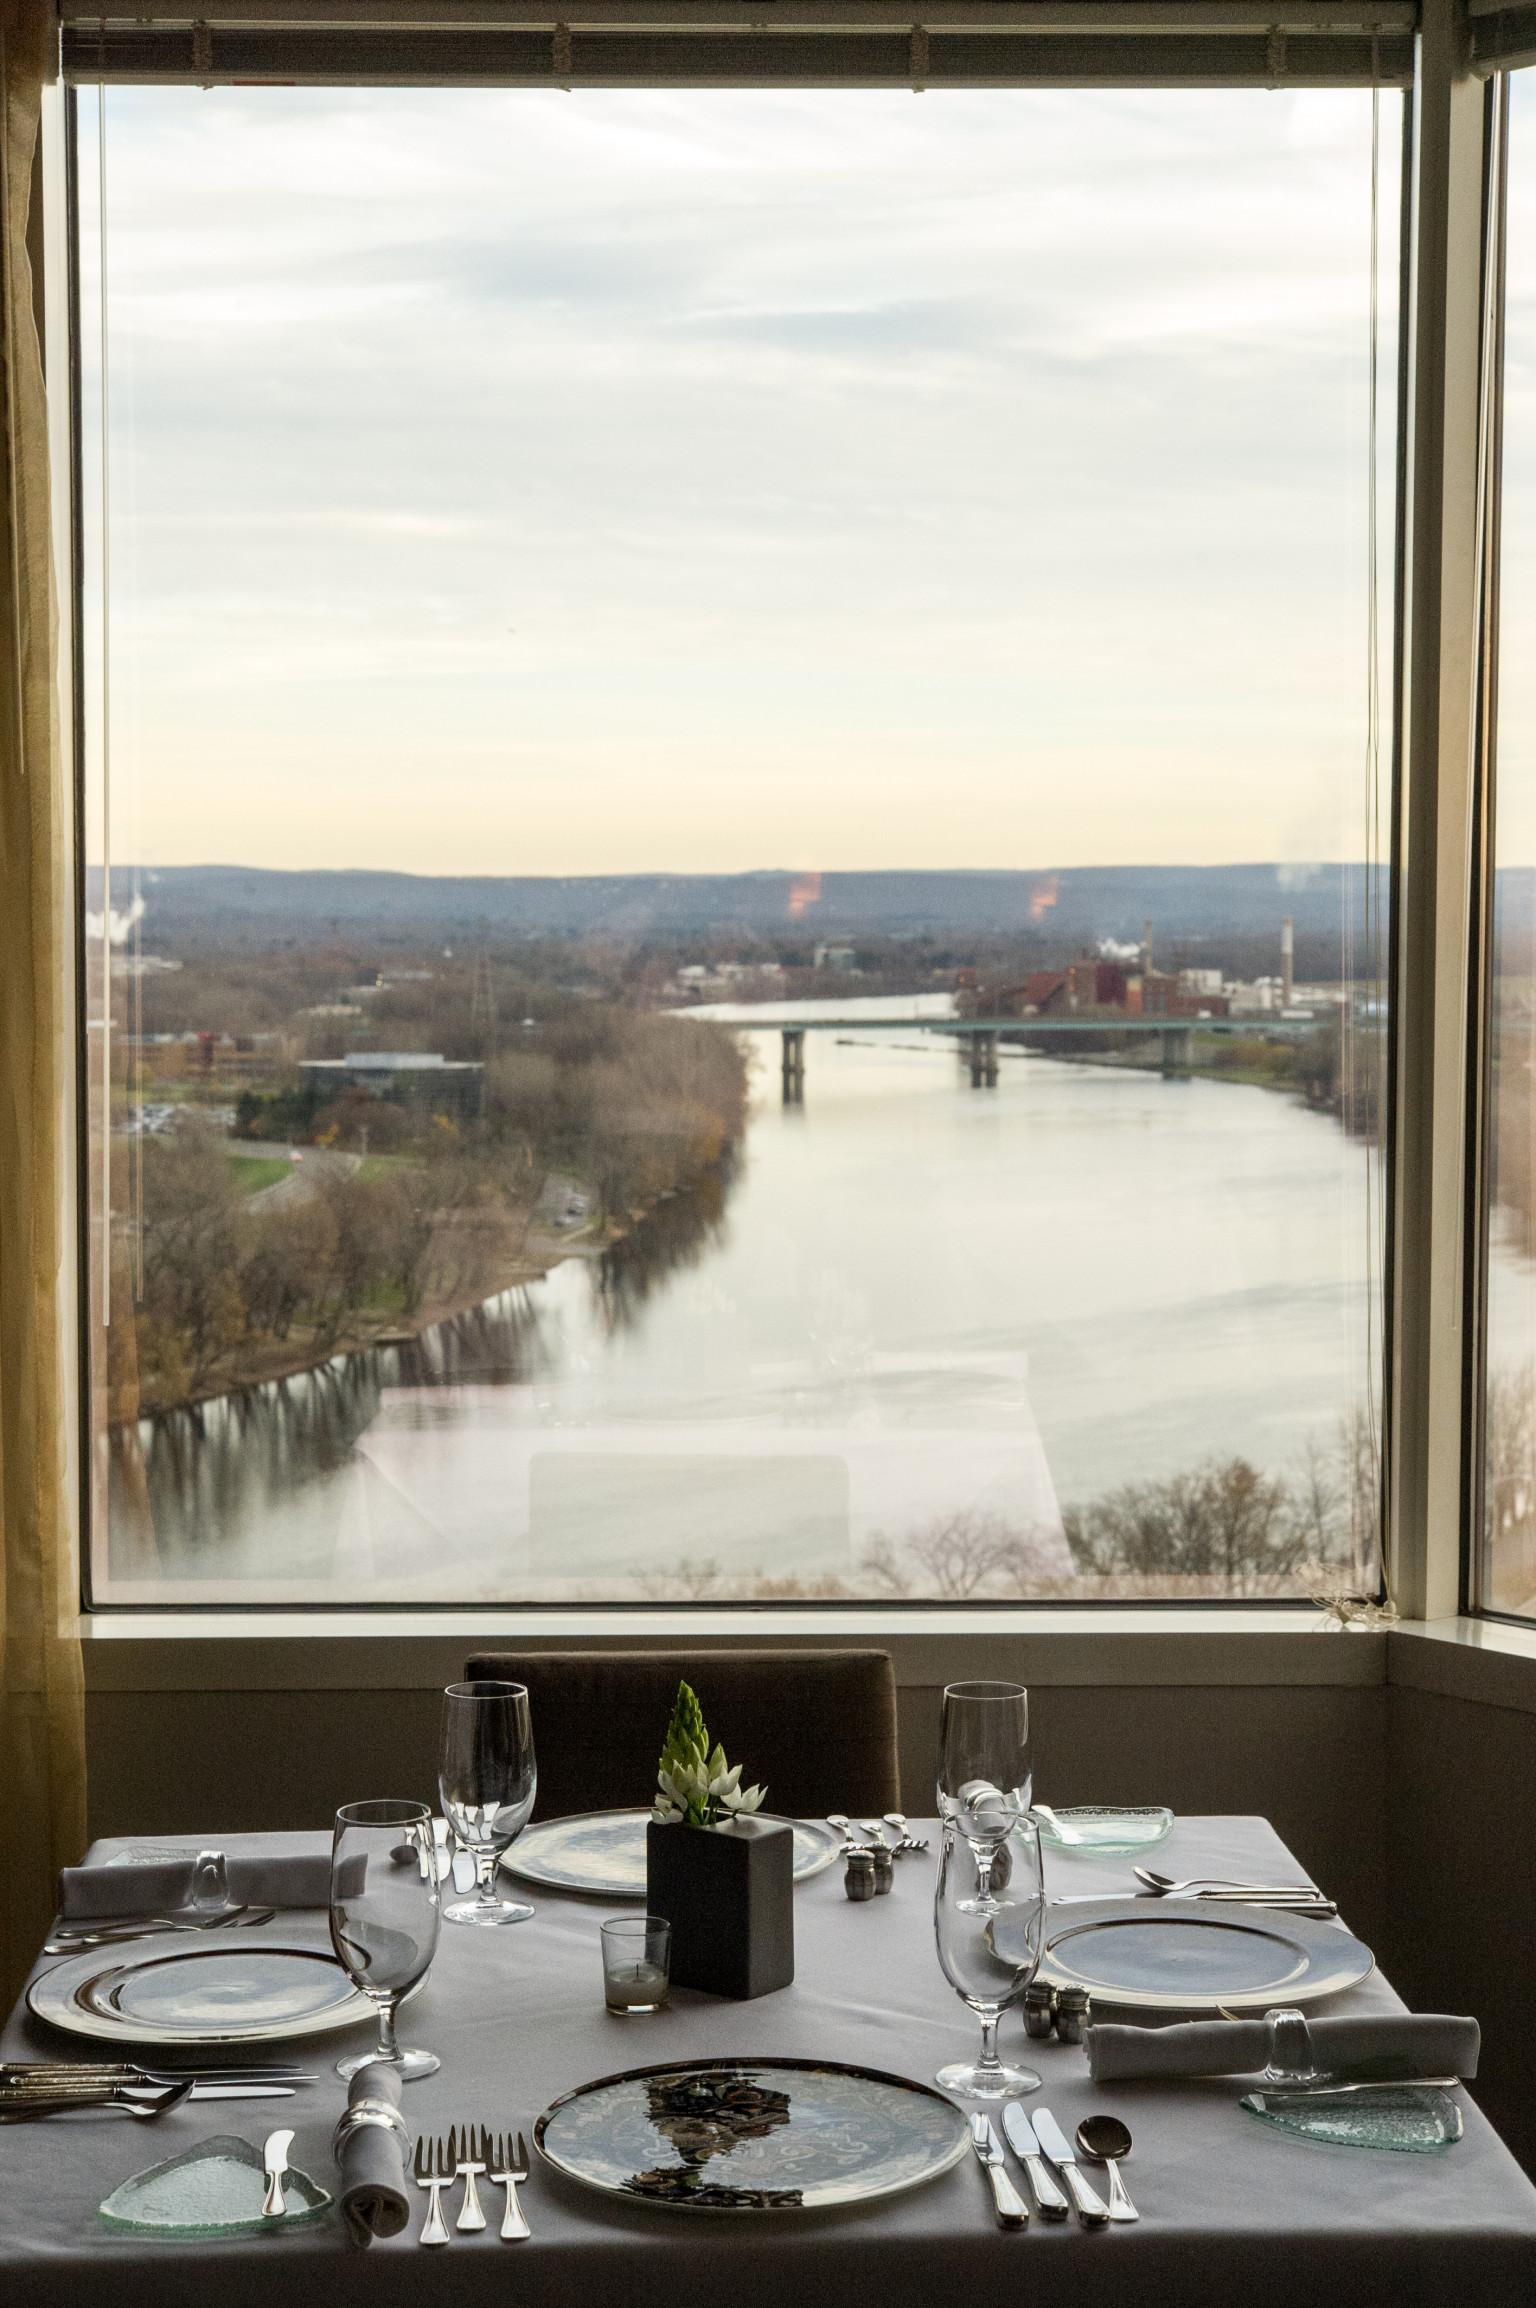 12 Unexpected Locations Of OpenTable\'s Top 100 Scenic Restaurants ...